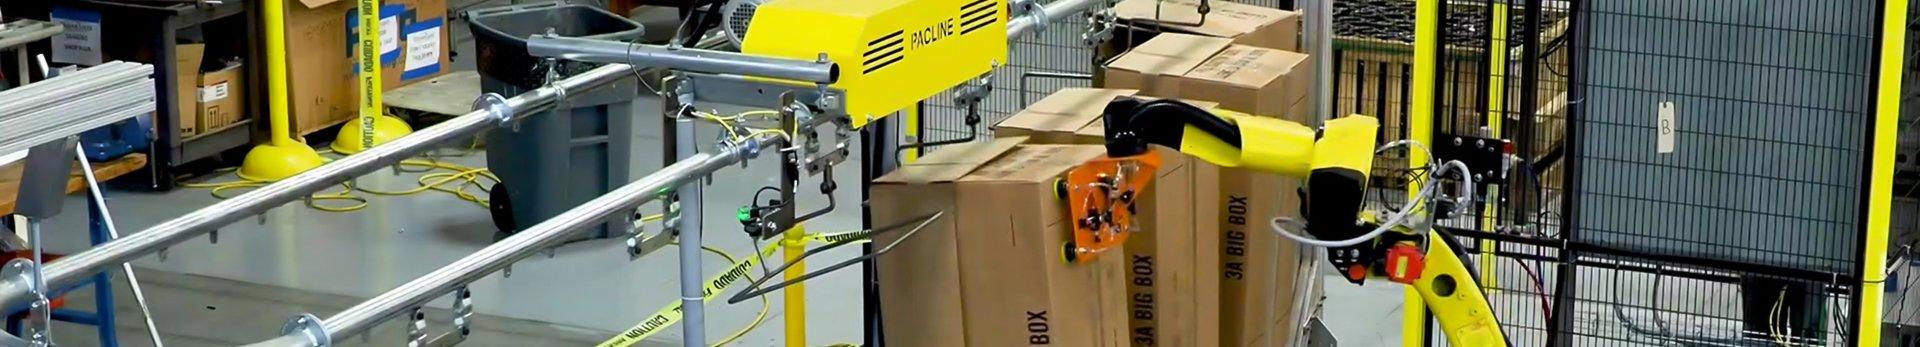 robotic loading on an overhead conveyor